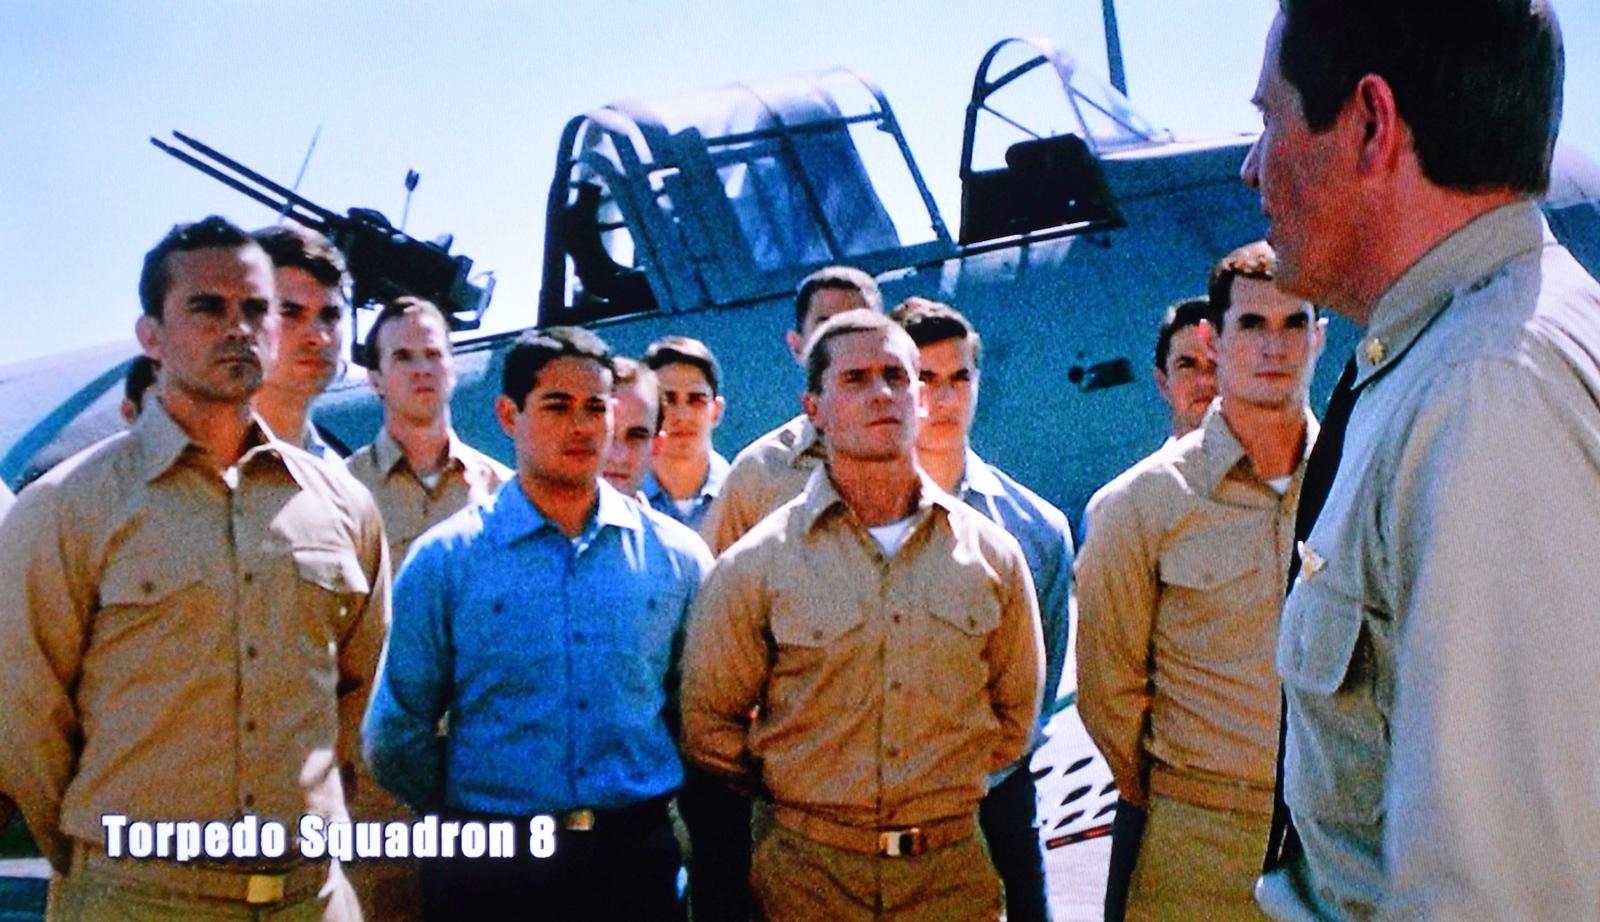 Torpedo Squadron 8 before Final Flight